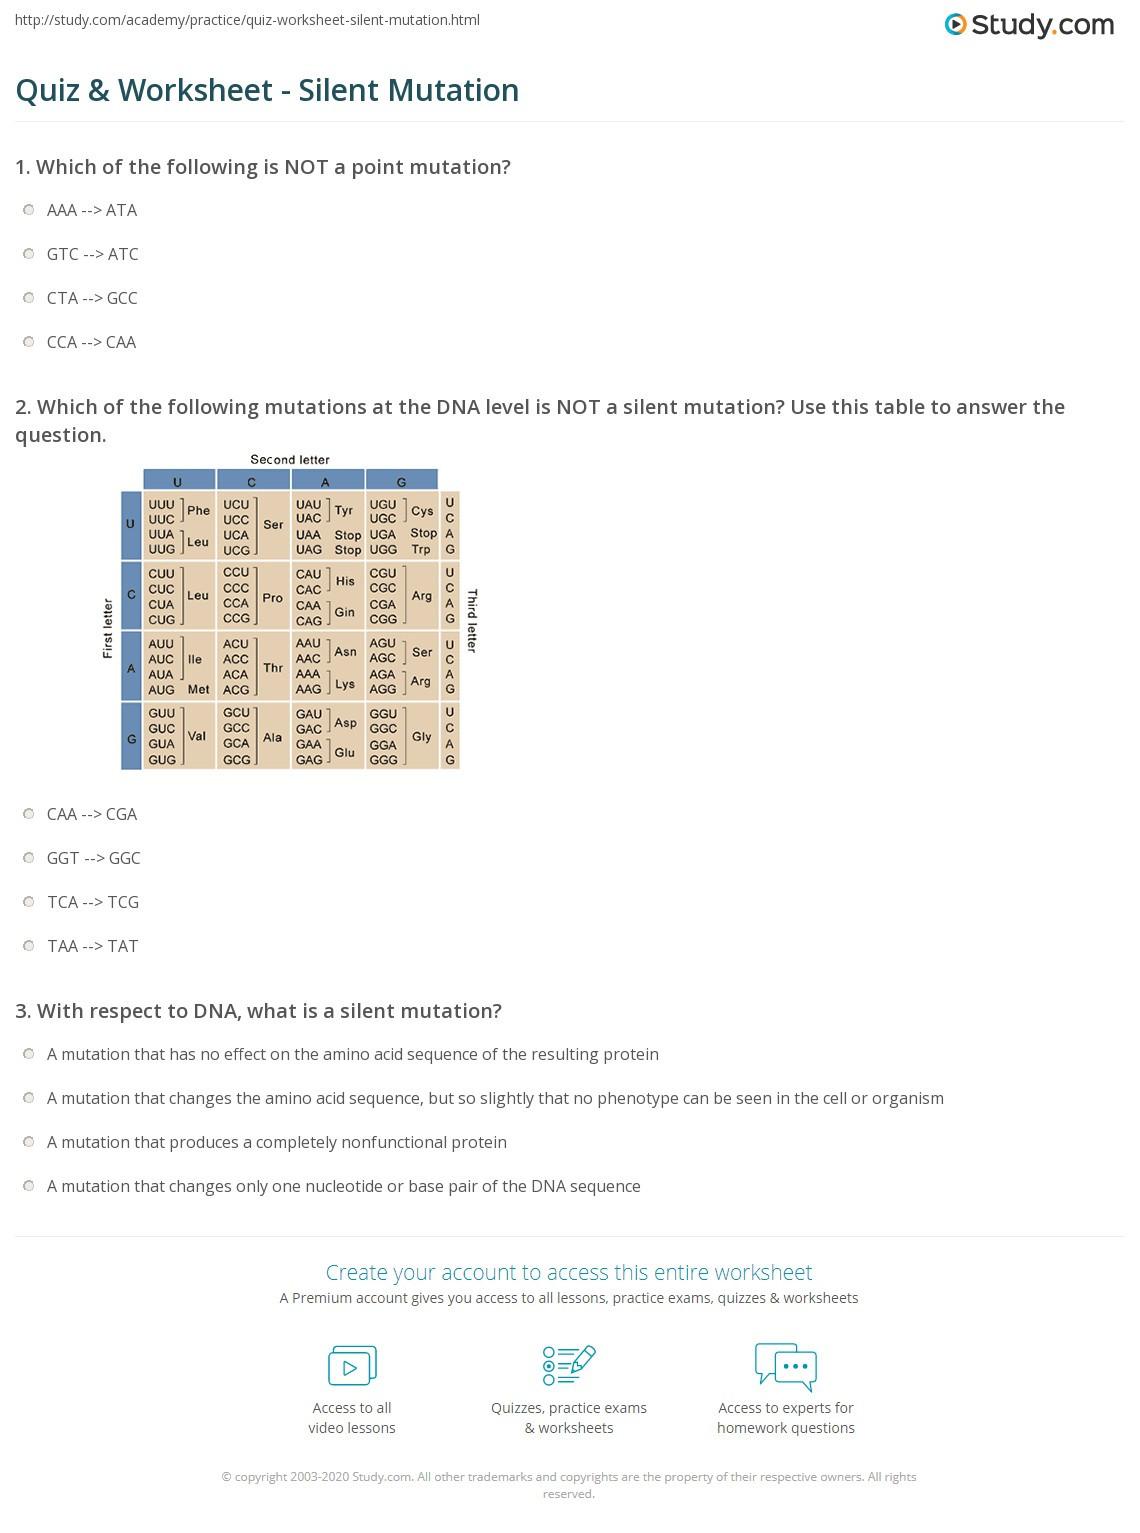 Dna Mutations Practice Worksheet Answers Quiz & Worksheet Silent Mutation